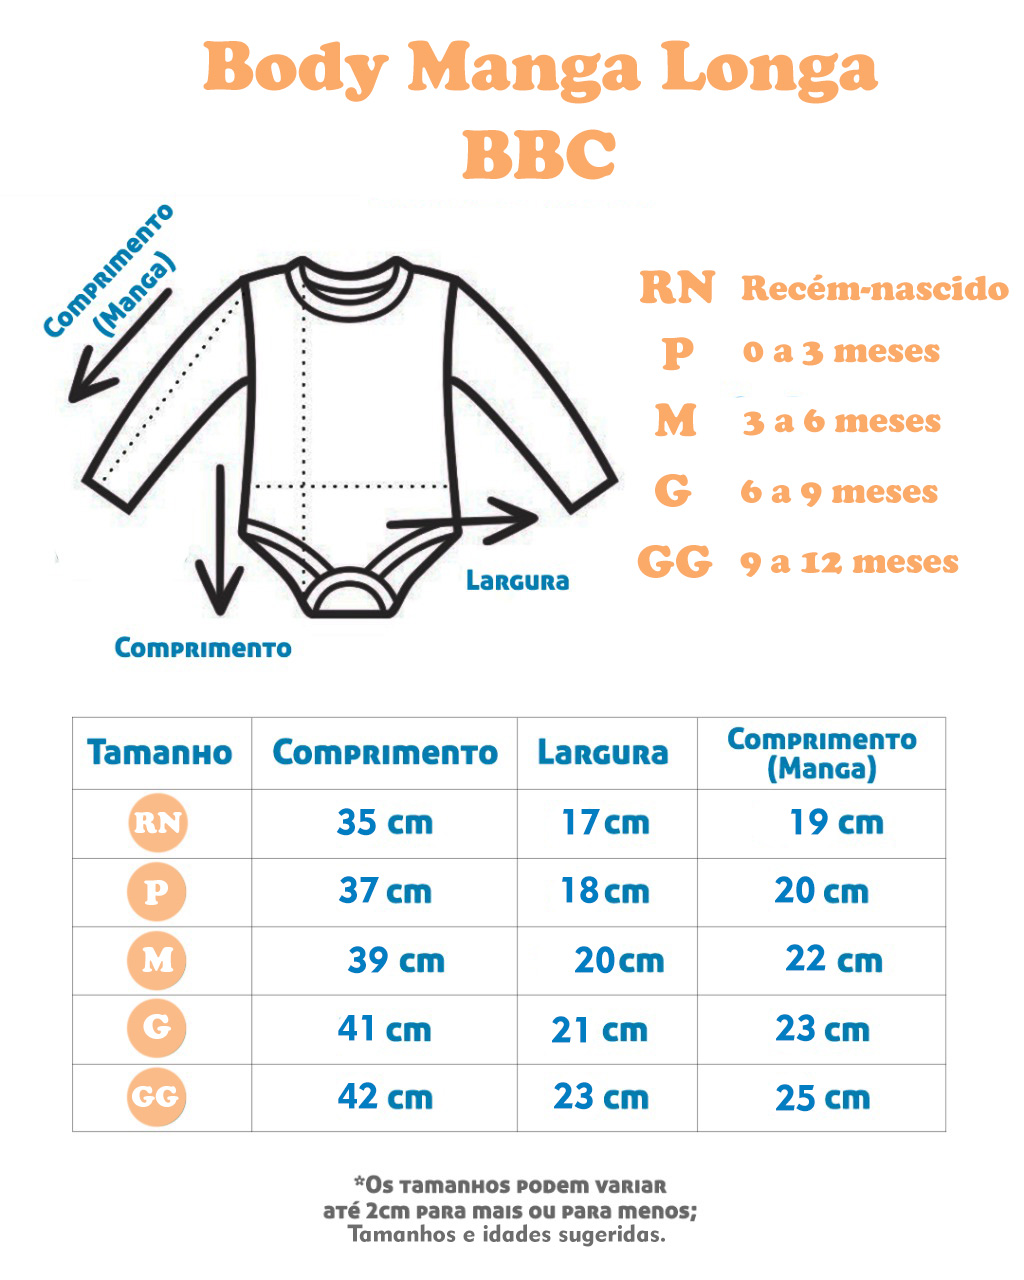 Body Manga Longa Branco Liso (RN/P/M/G/GG)